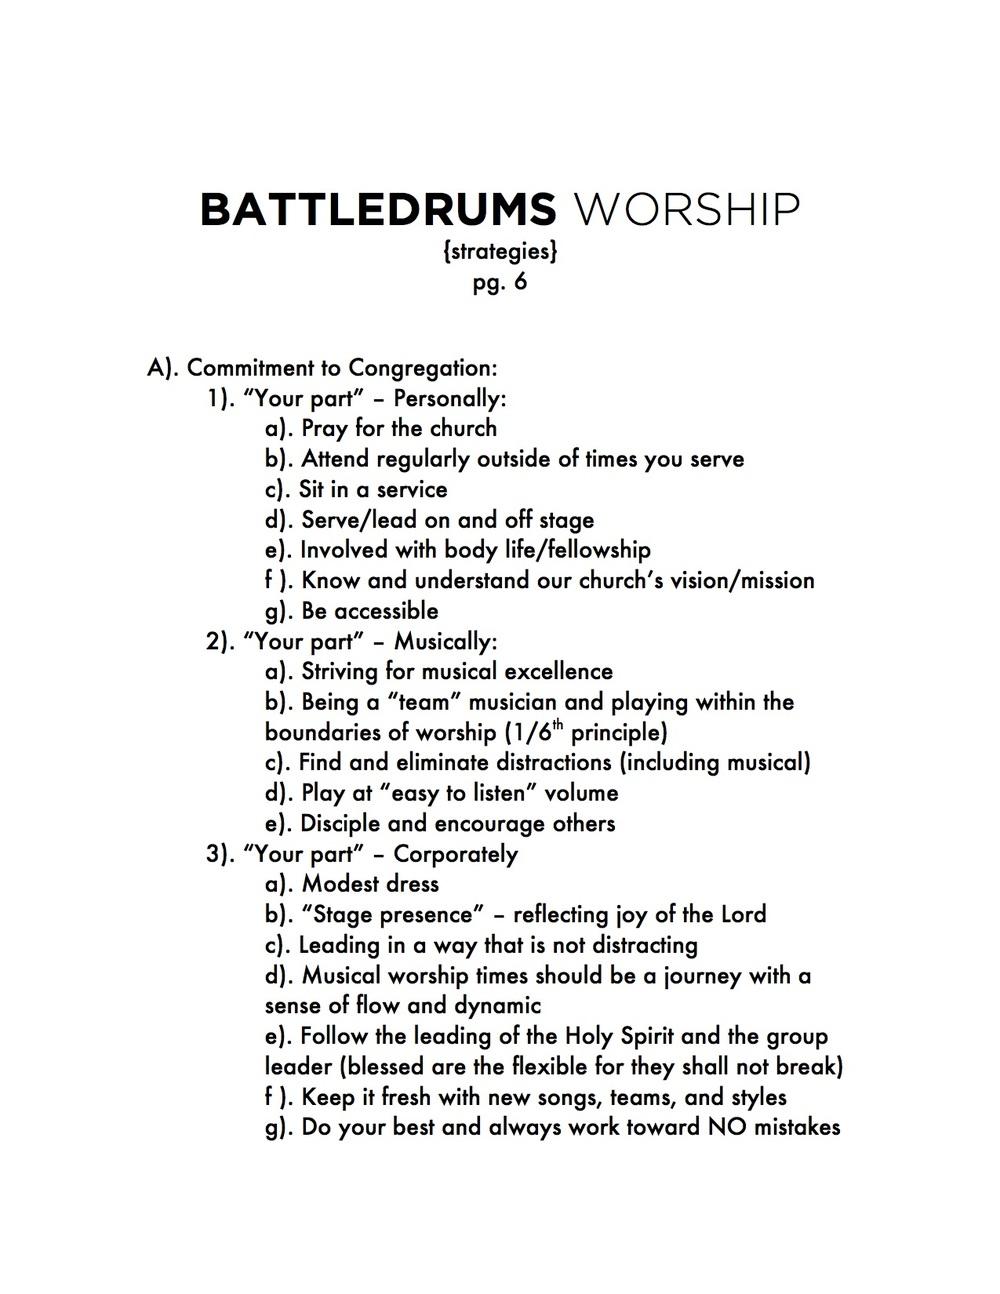 battledrumsHBWeb-pg6.jpg